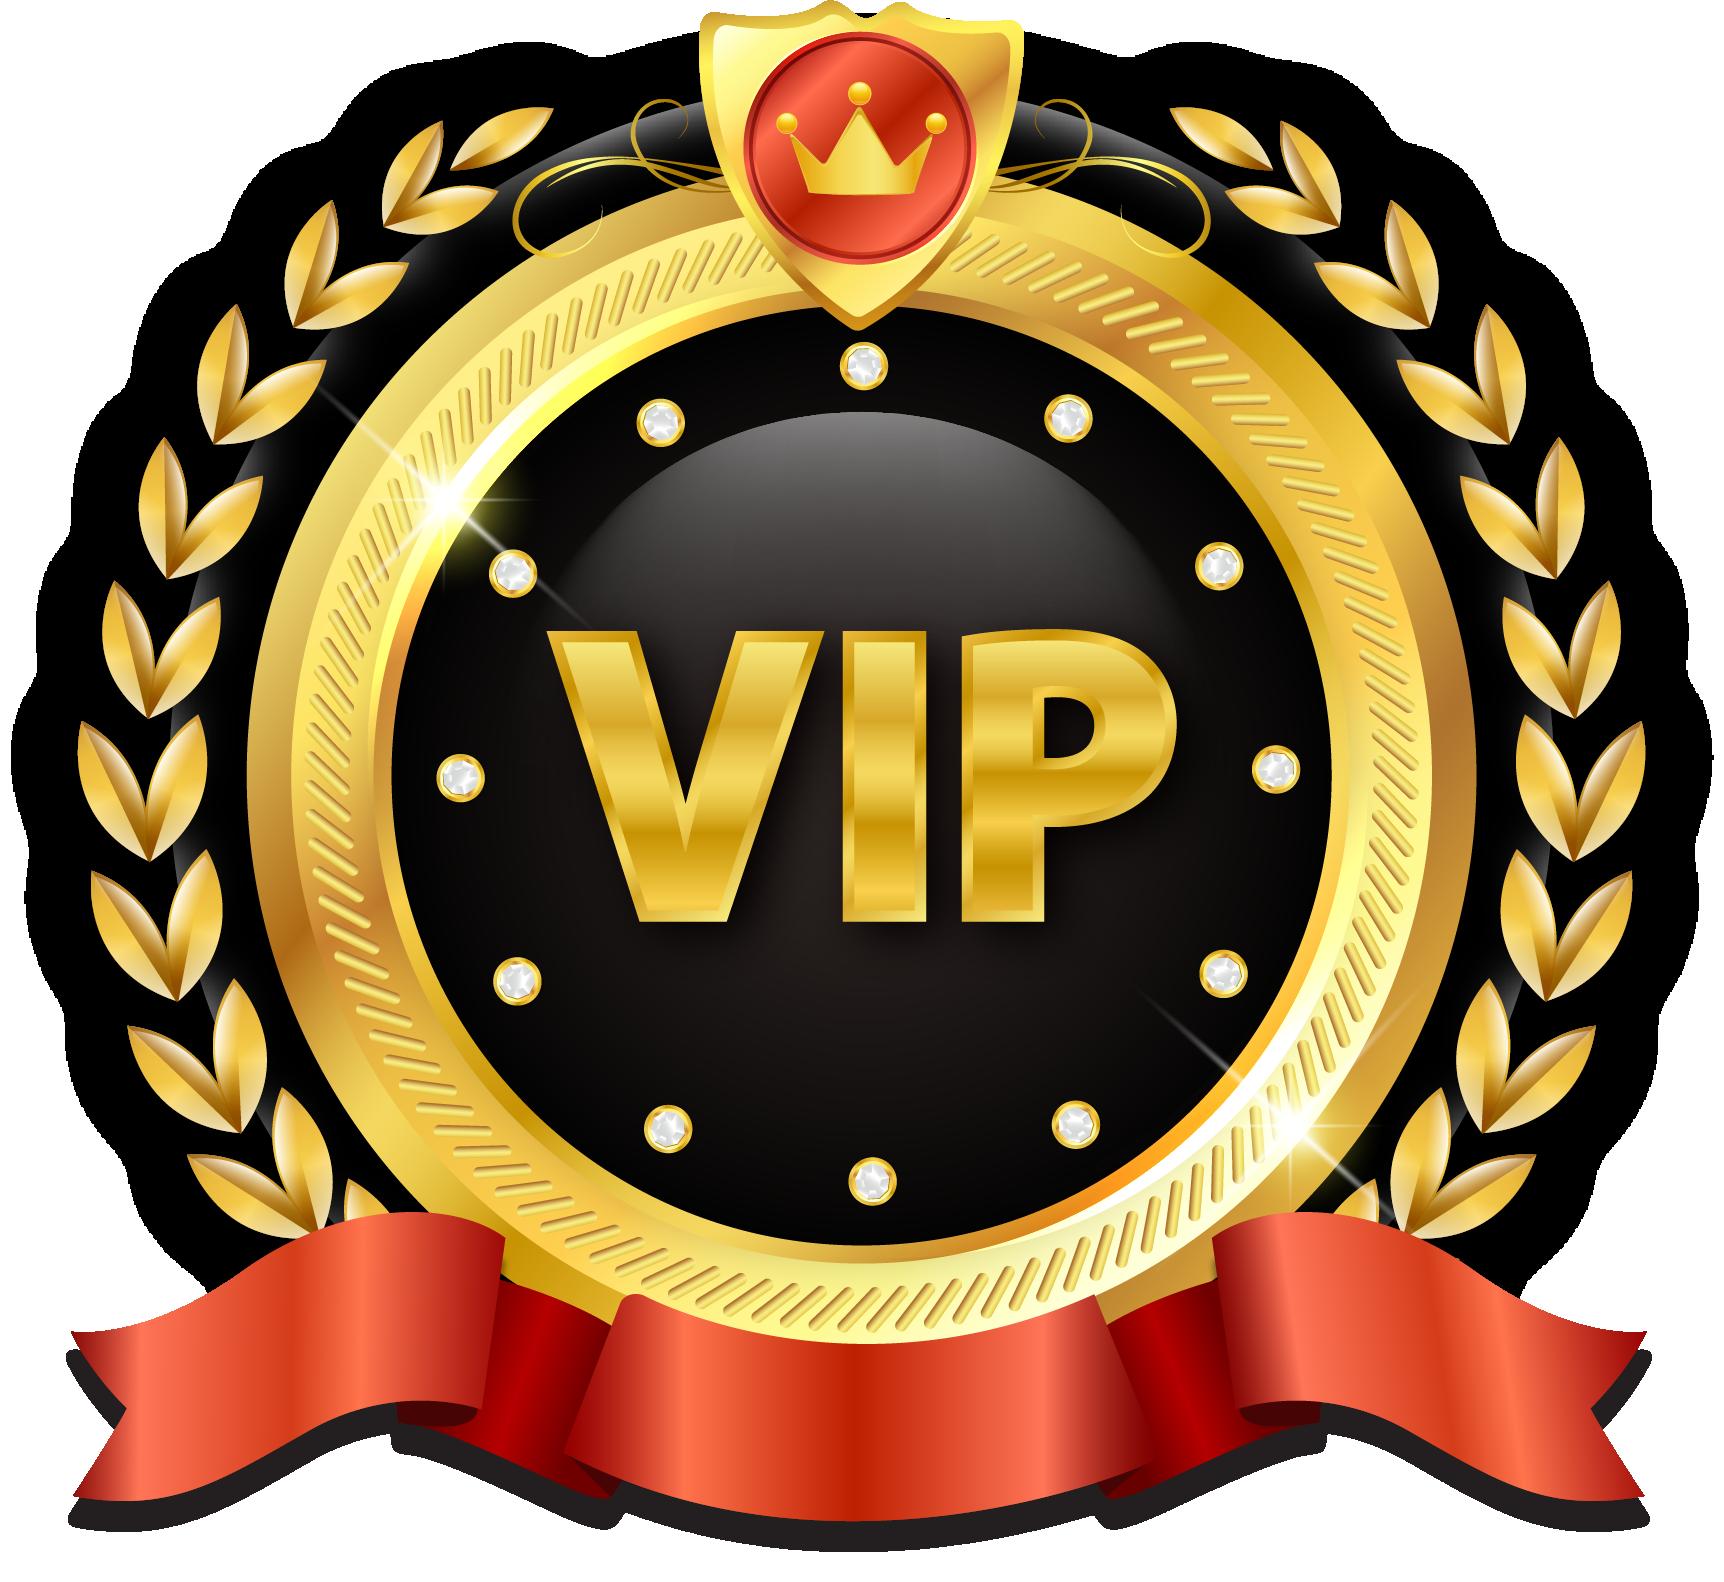 VIP PNG Transparent Image.